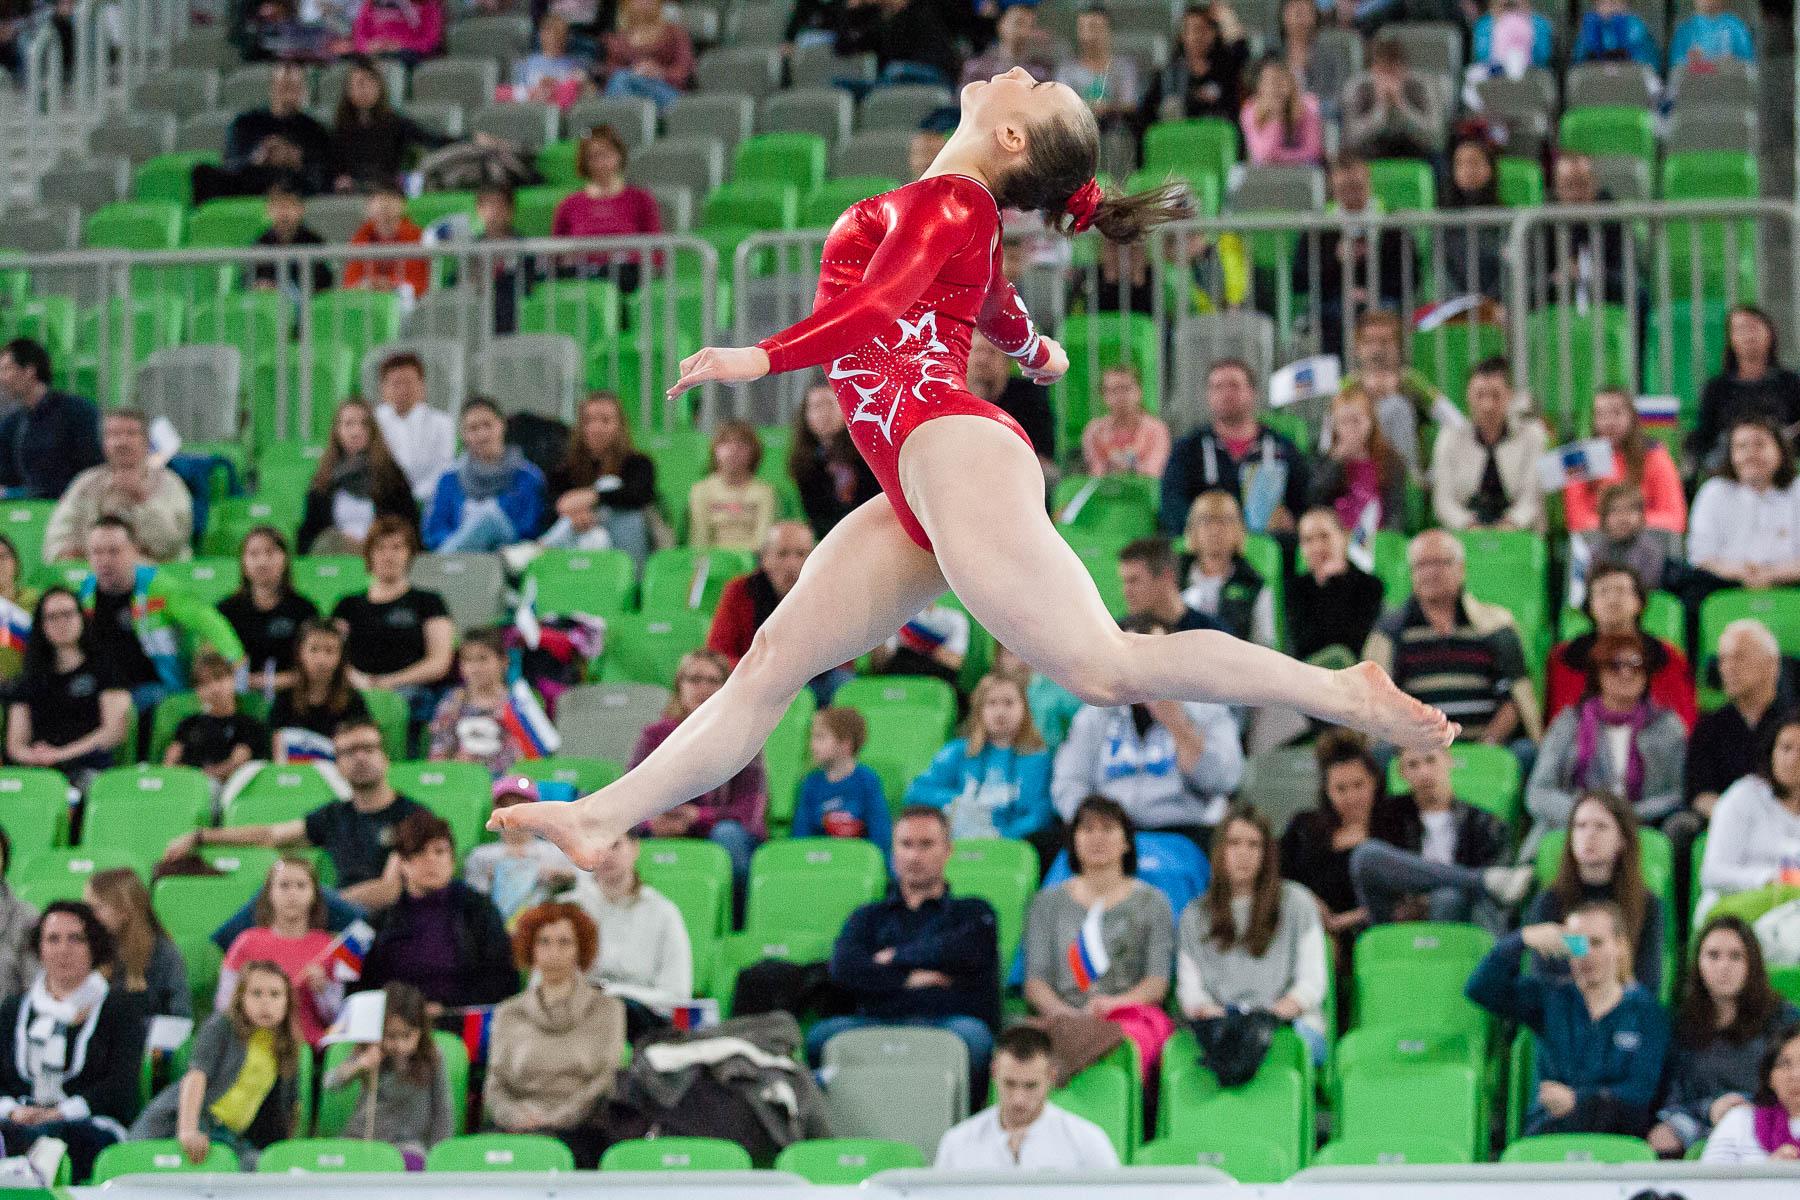 ArtGymnasticsWorldCupLjubljana-photoLukaDakskobler-009